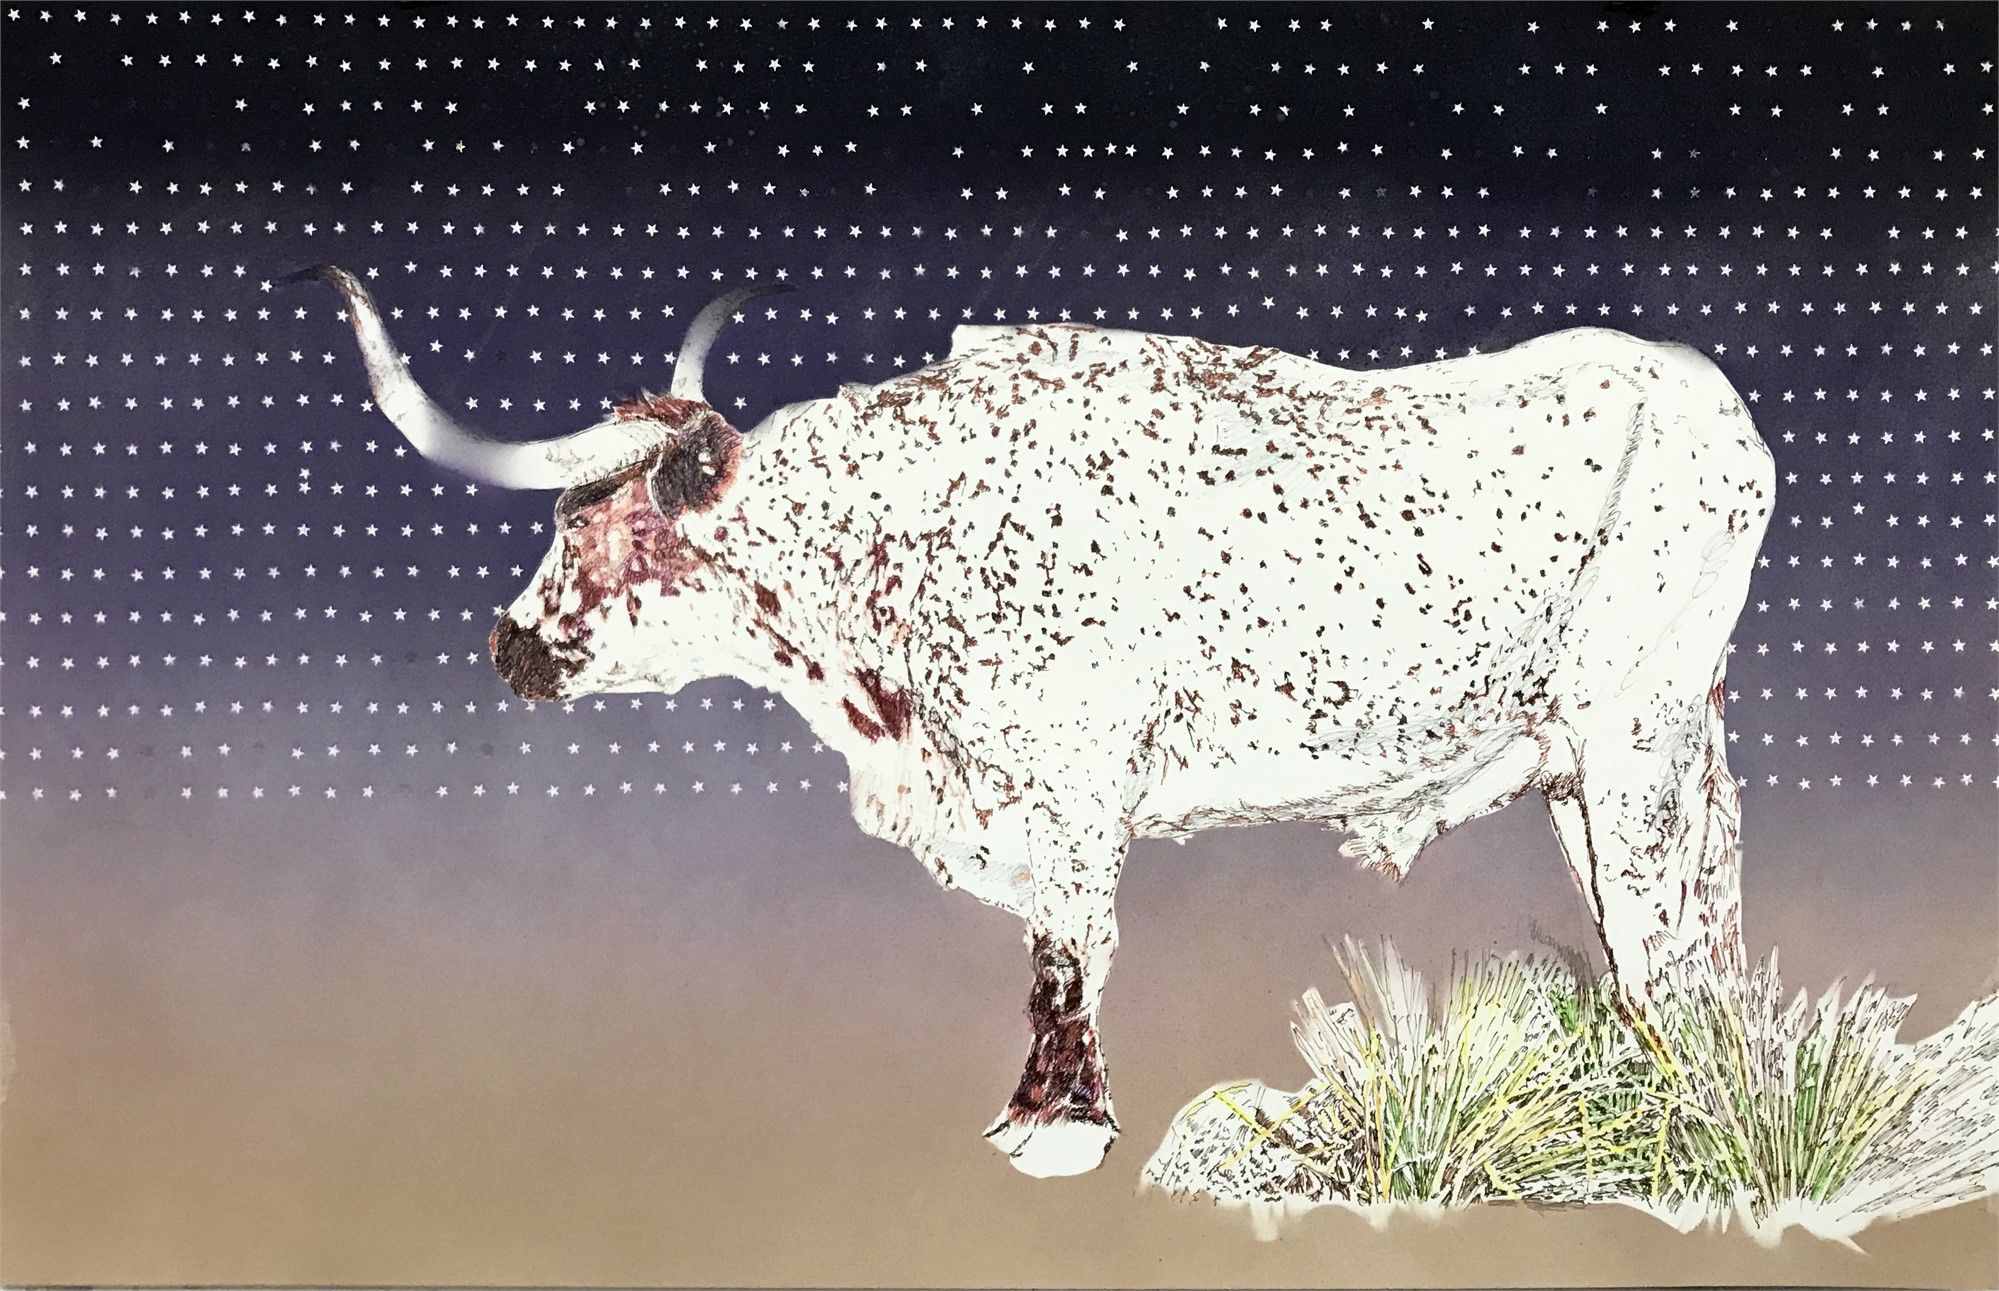 Starry Knight by Jim Malone